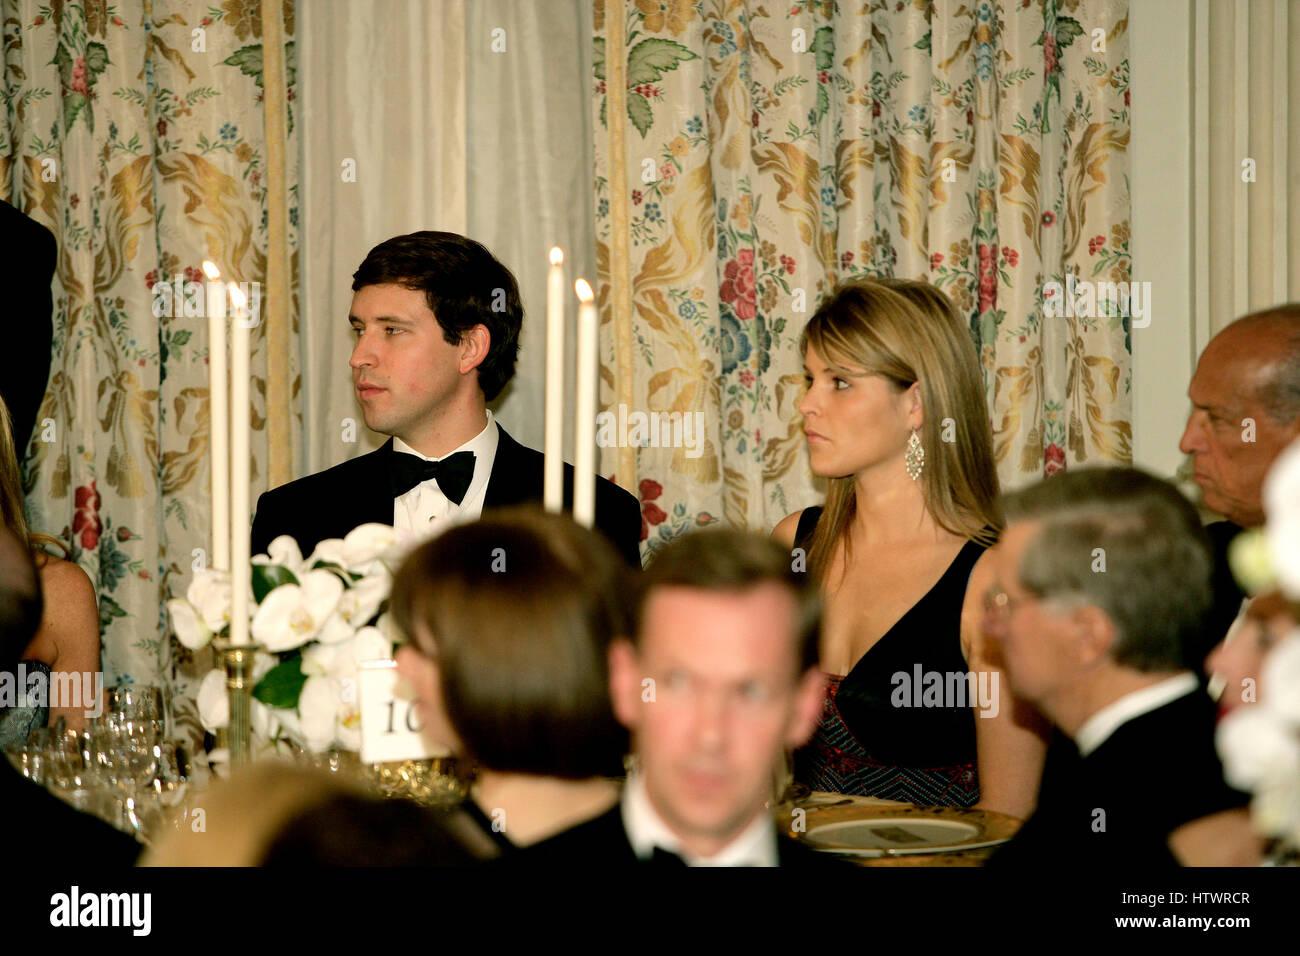 Washington, D.C - November 2, 2005 -- Jenna Bush, right, daughter of United States President George W Bush, attends - Stock Image